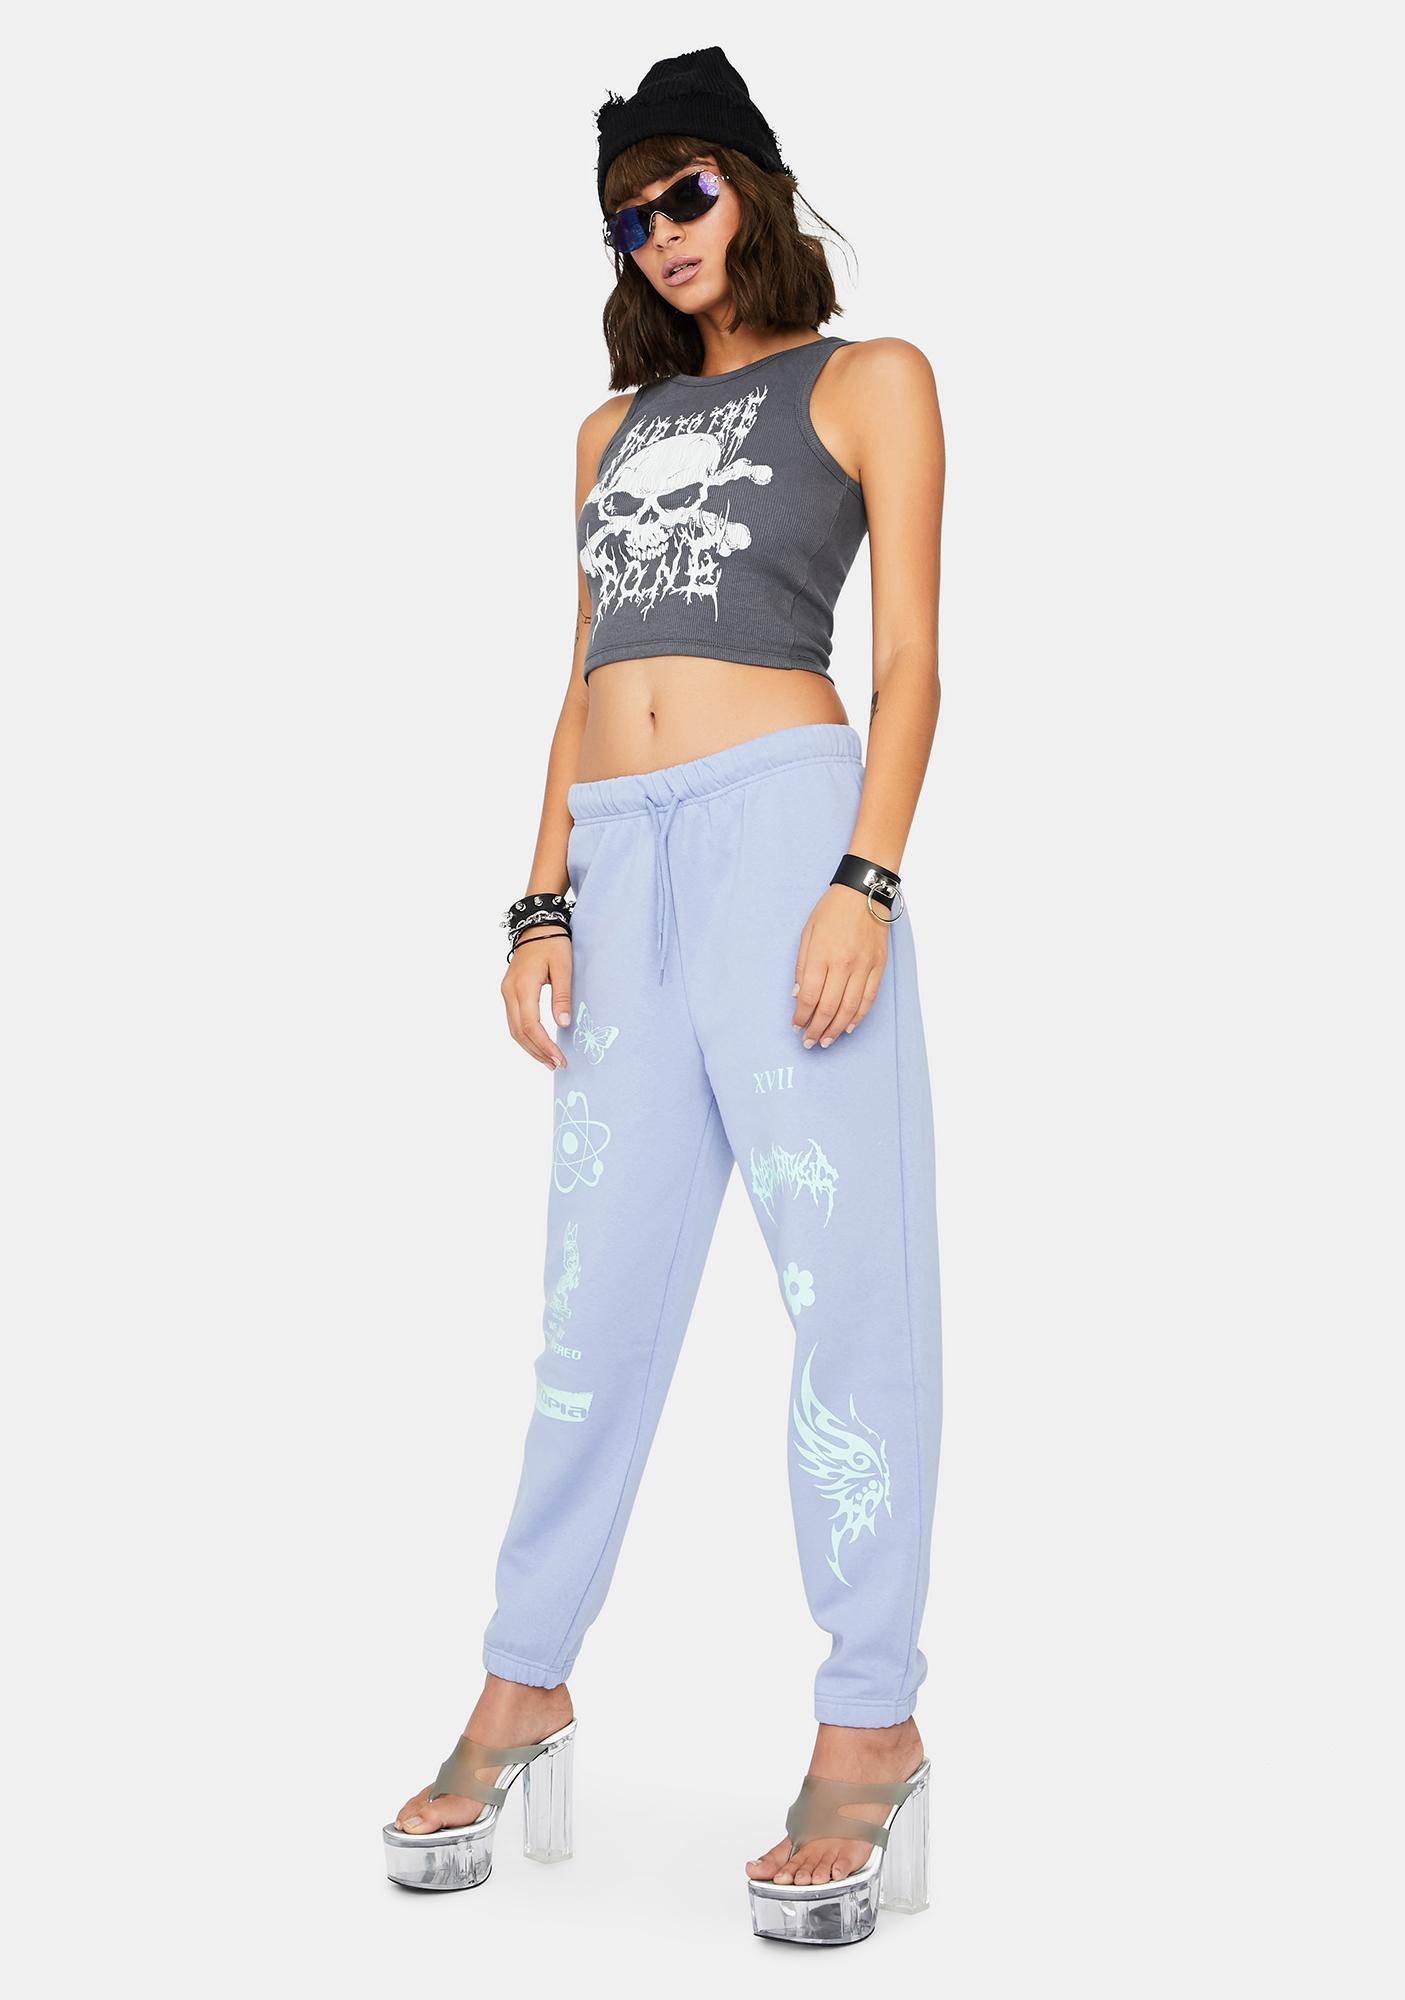 NEW GIRL ORDER Pale Blue Jogger Sweatpants